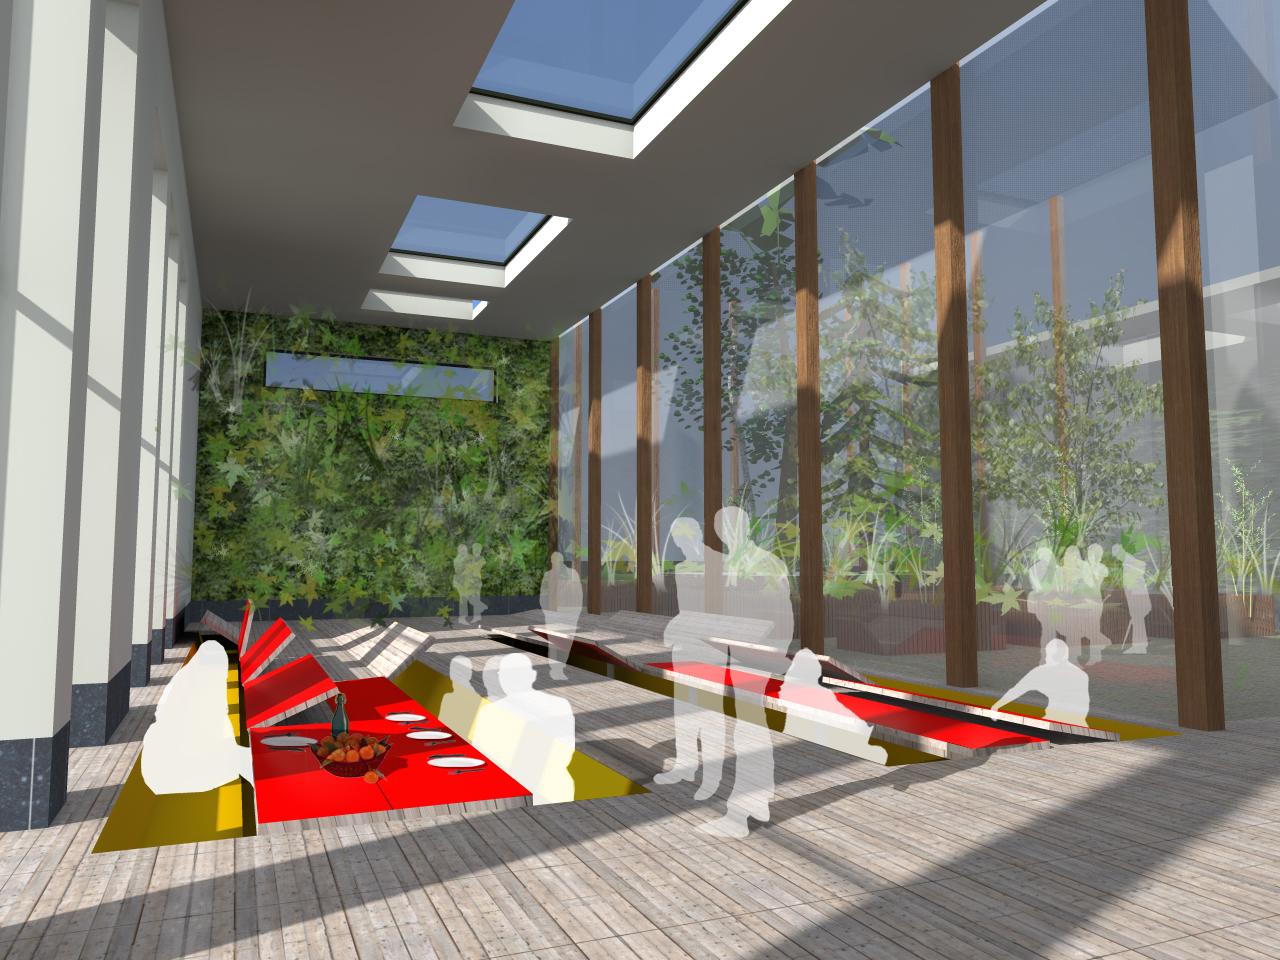 ecole-hotel-solar-bagnolet-modul-7